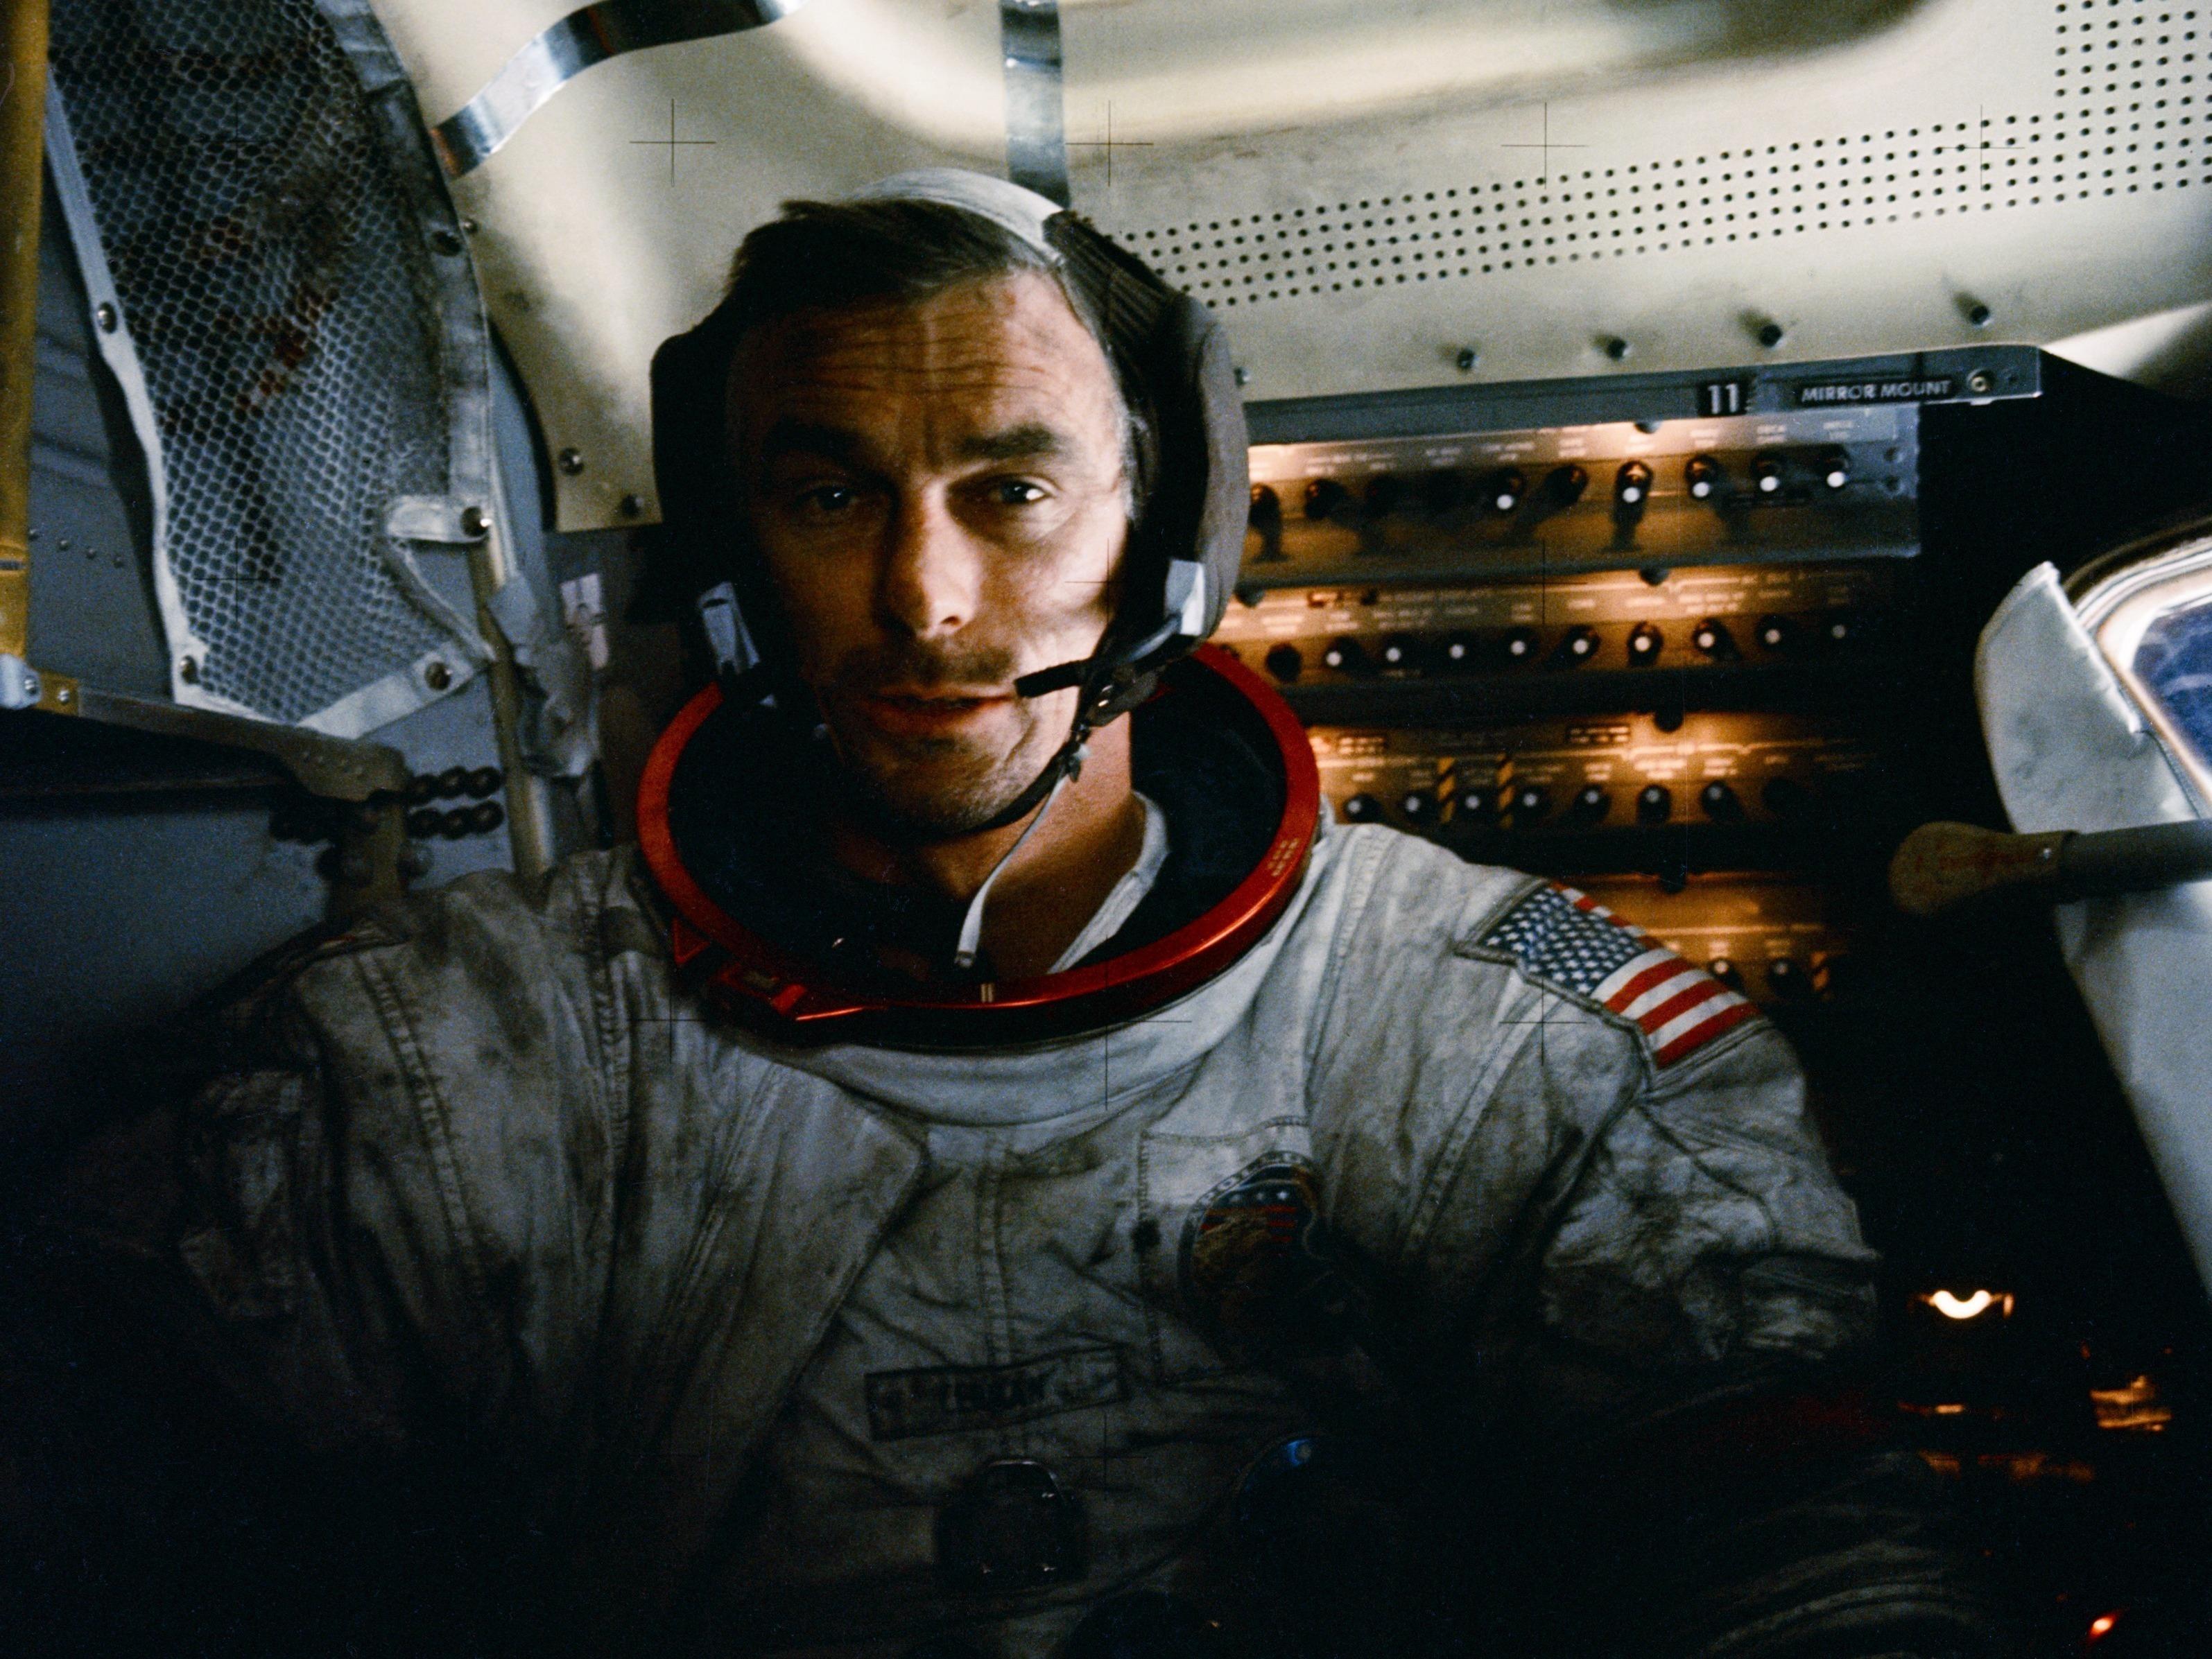 Gene Cernan in the Apollo 17 lunar module after one of three moonwalks.(NASA)